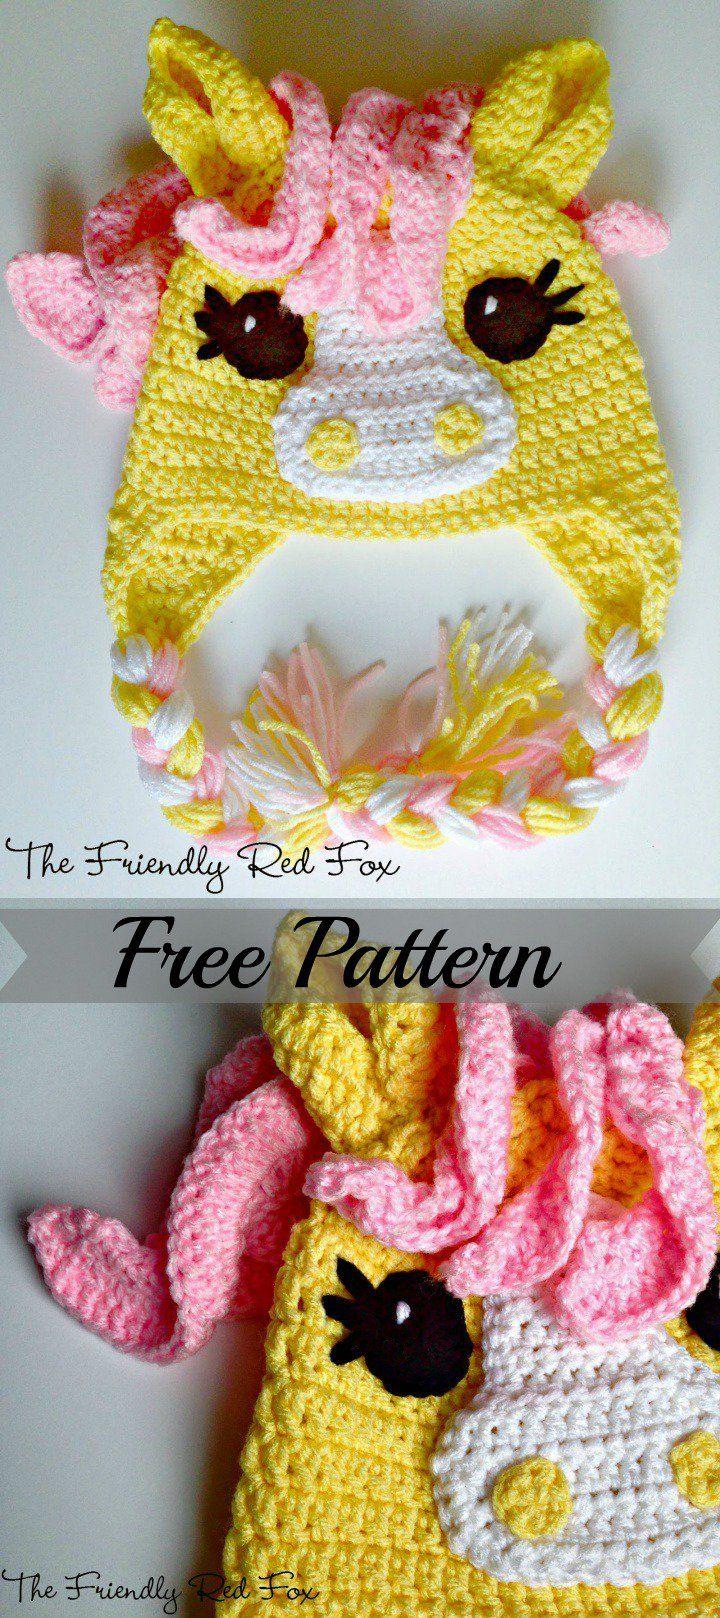 40 Crochet Animal Hat With Patterns Crochet Unicorn Hat Crochet Hat Pattern Crochet Animal Hats